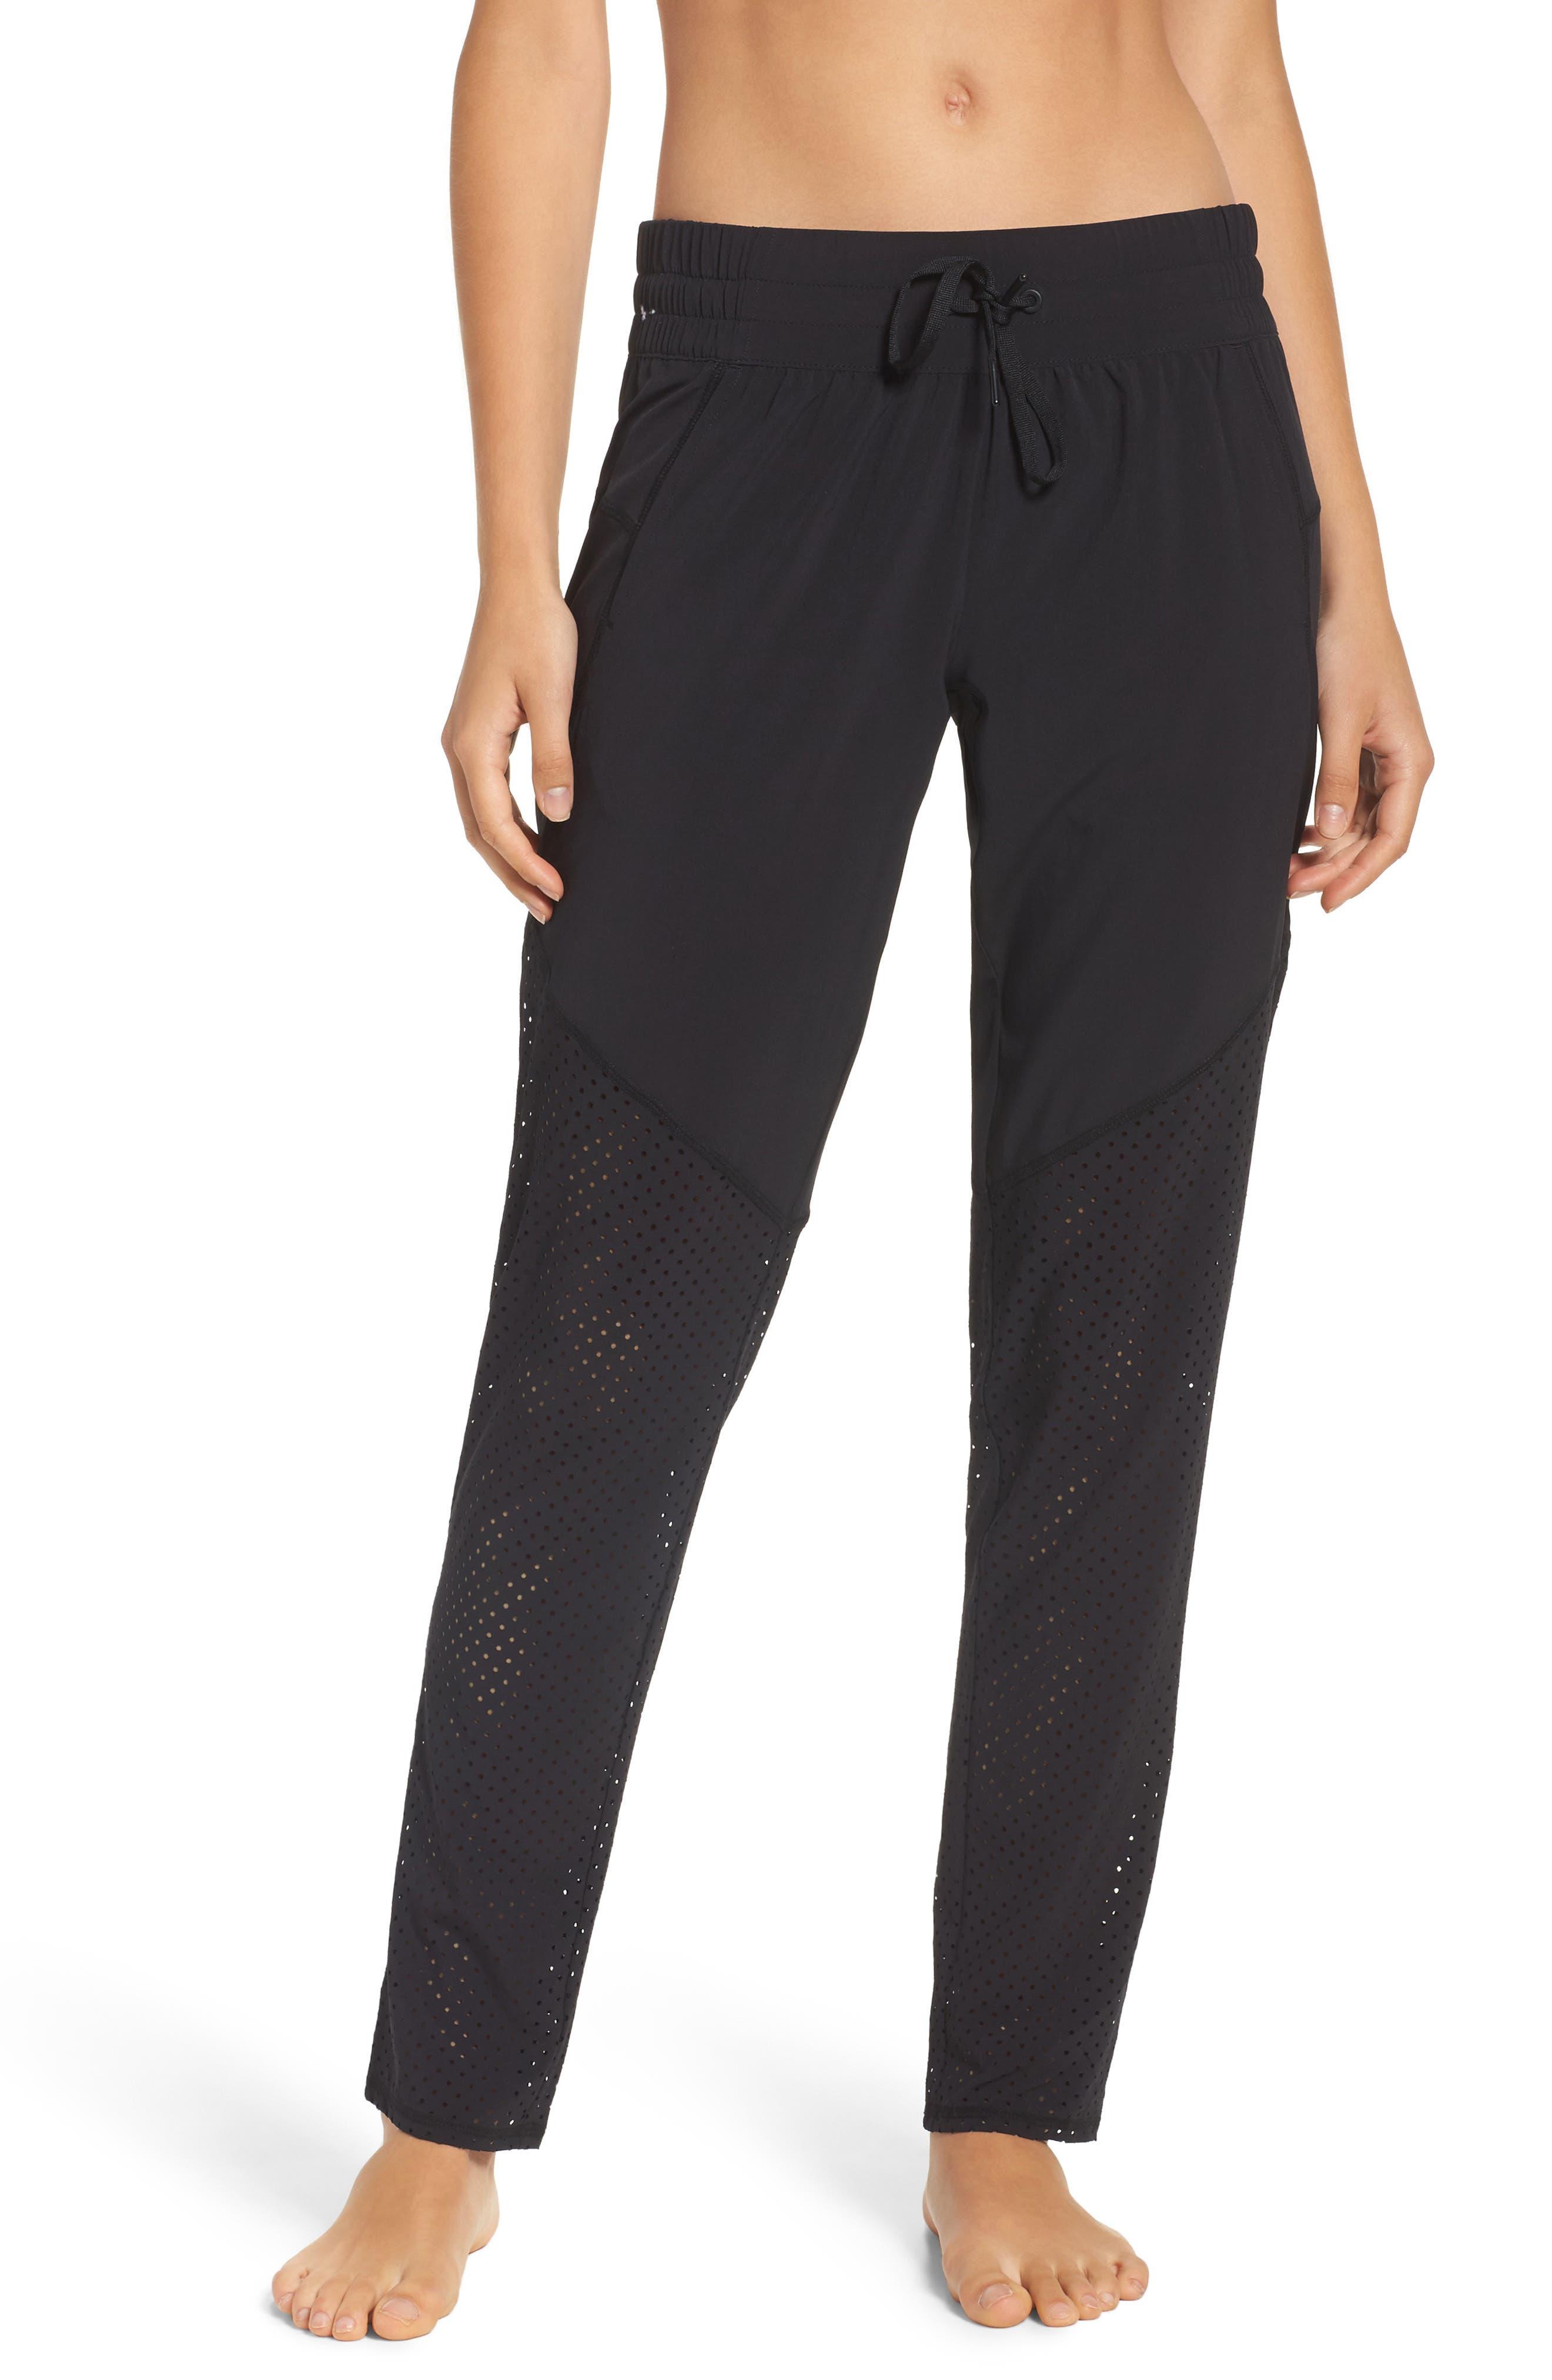 Euphoria Sweatpants,                         Main,                         color, 001